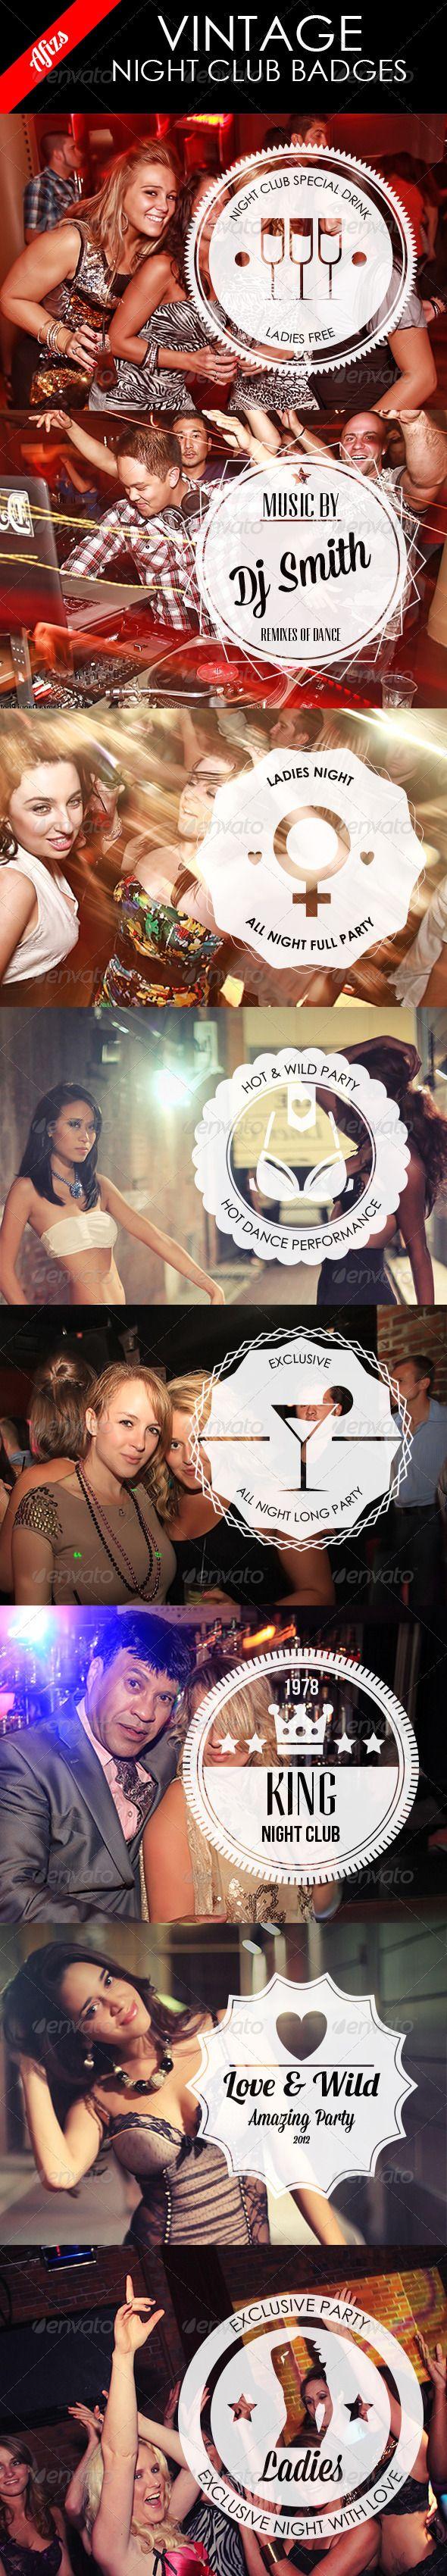 Night Club Vintage Badges - GraphicRiver Item for Sale